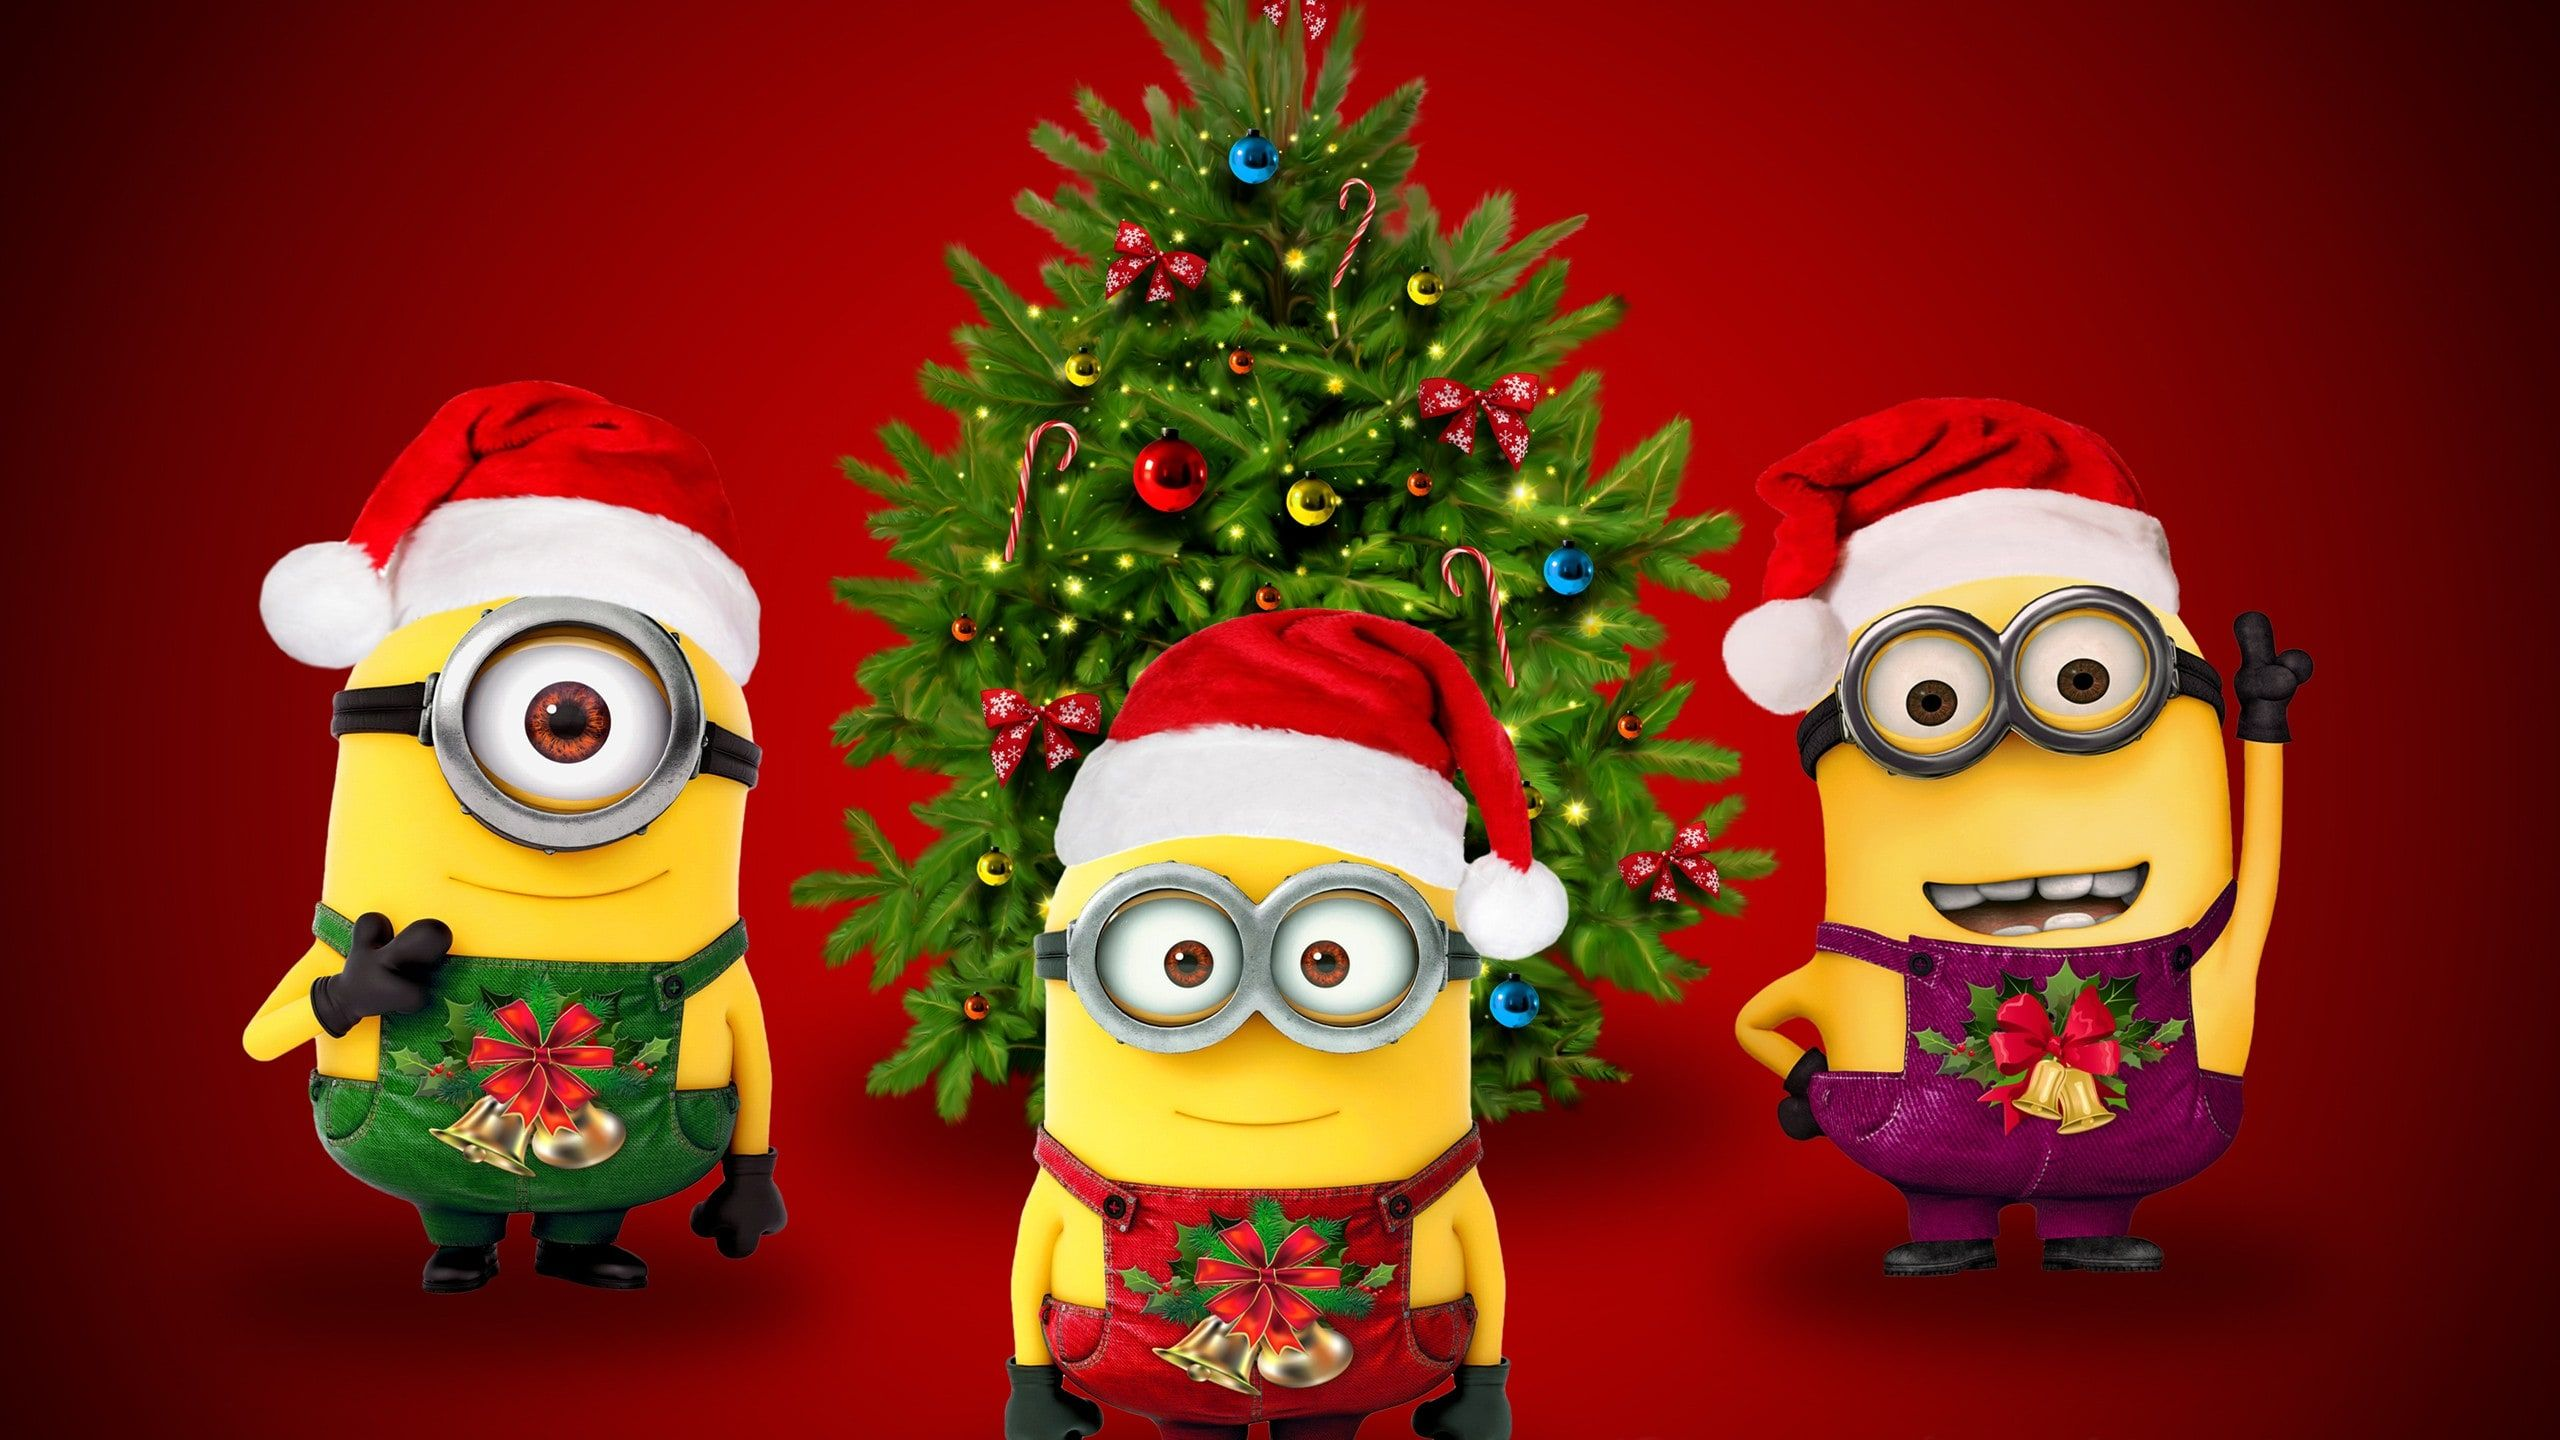 Desktophdwallpaper Org Minion Christmas Merry Christmas Minions Merry Christmas Sms